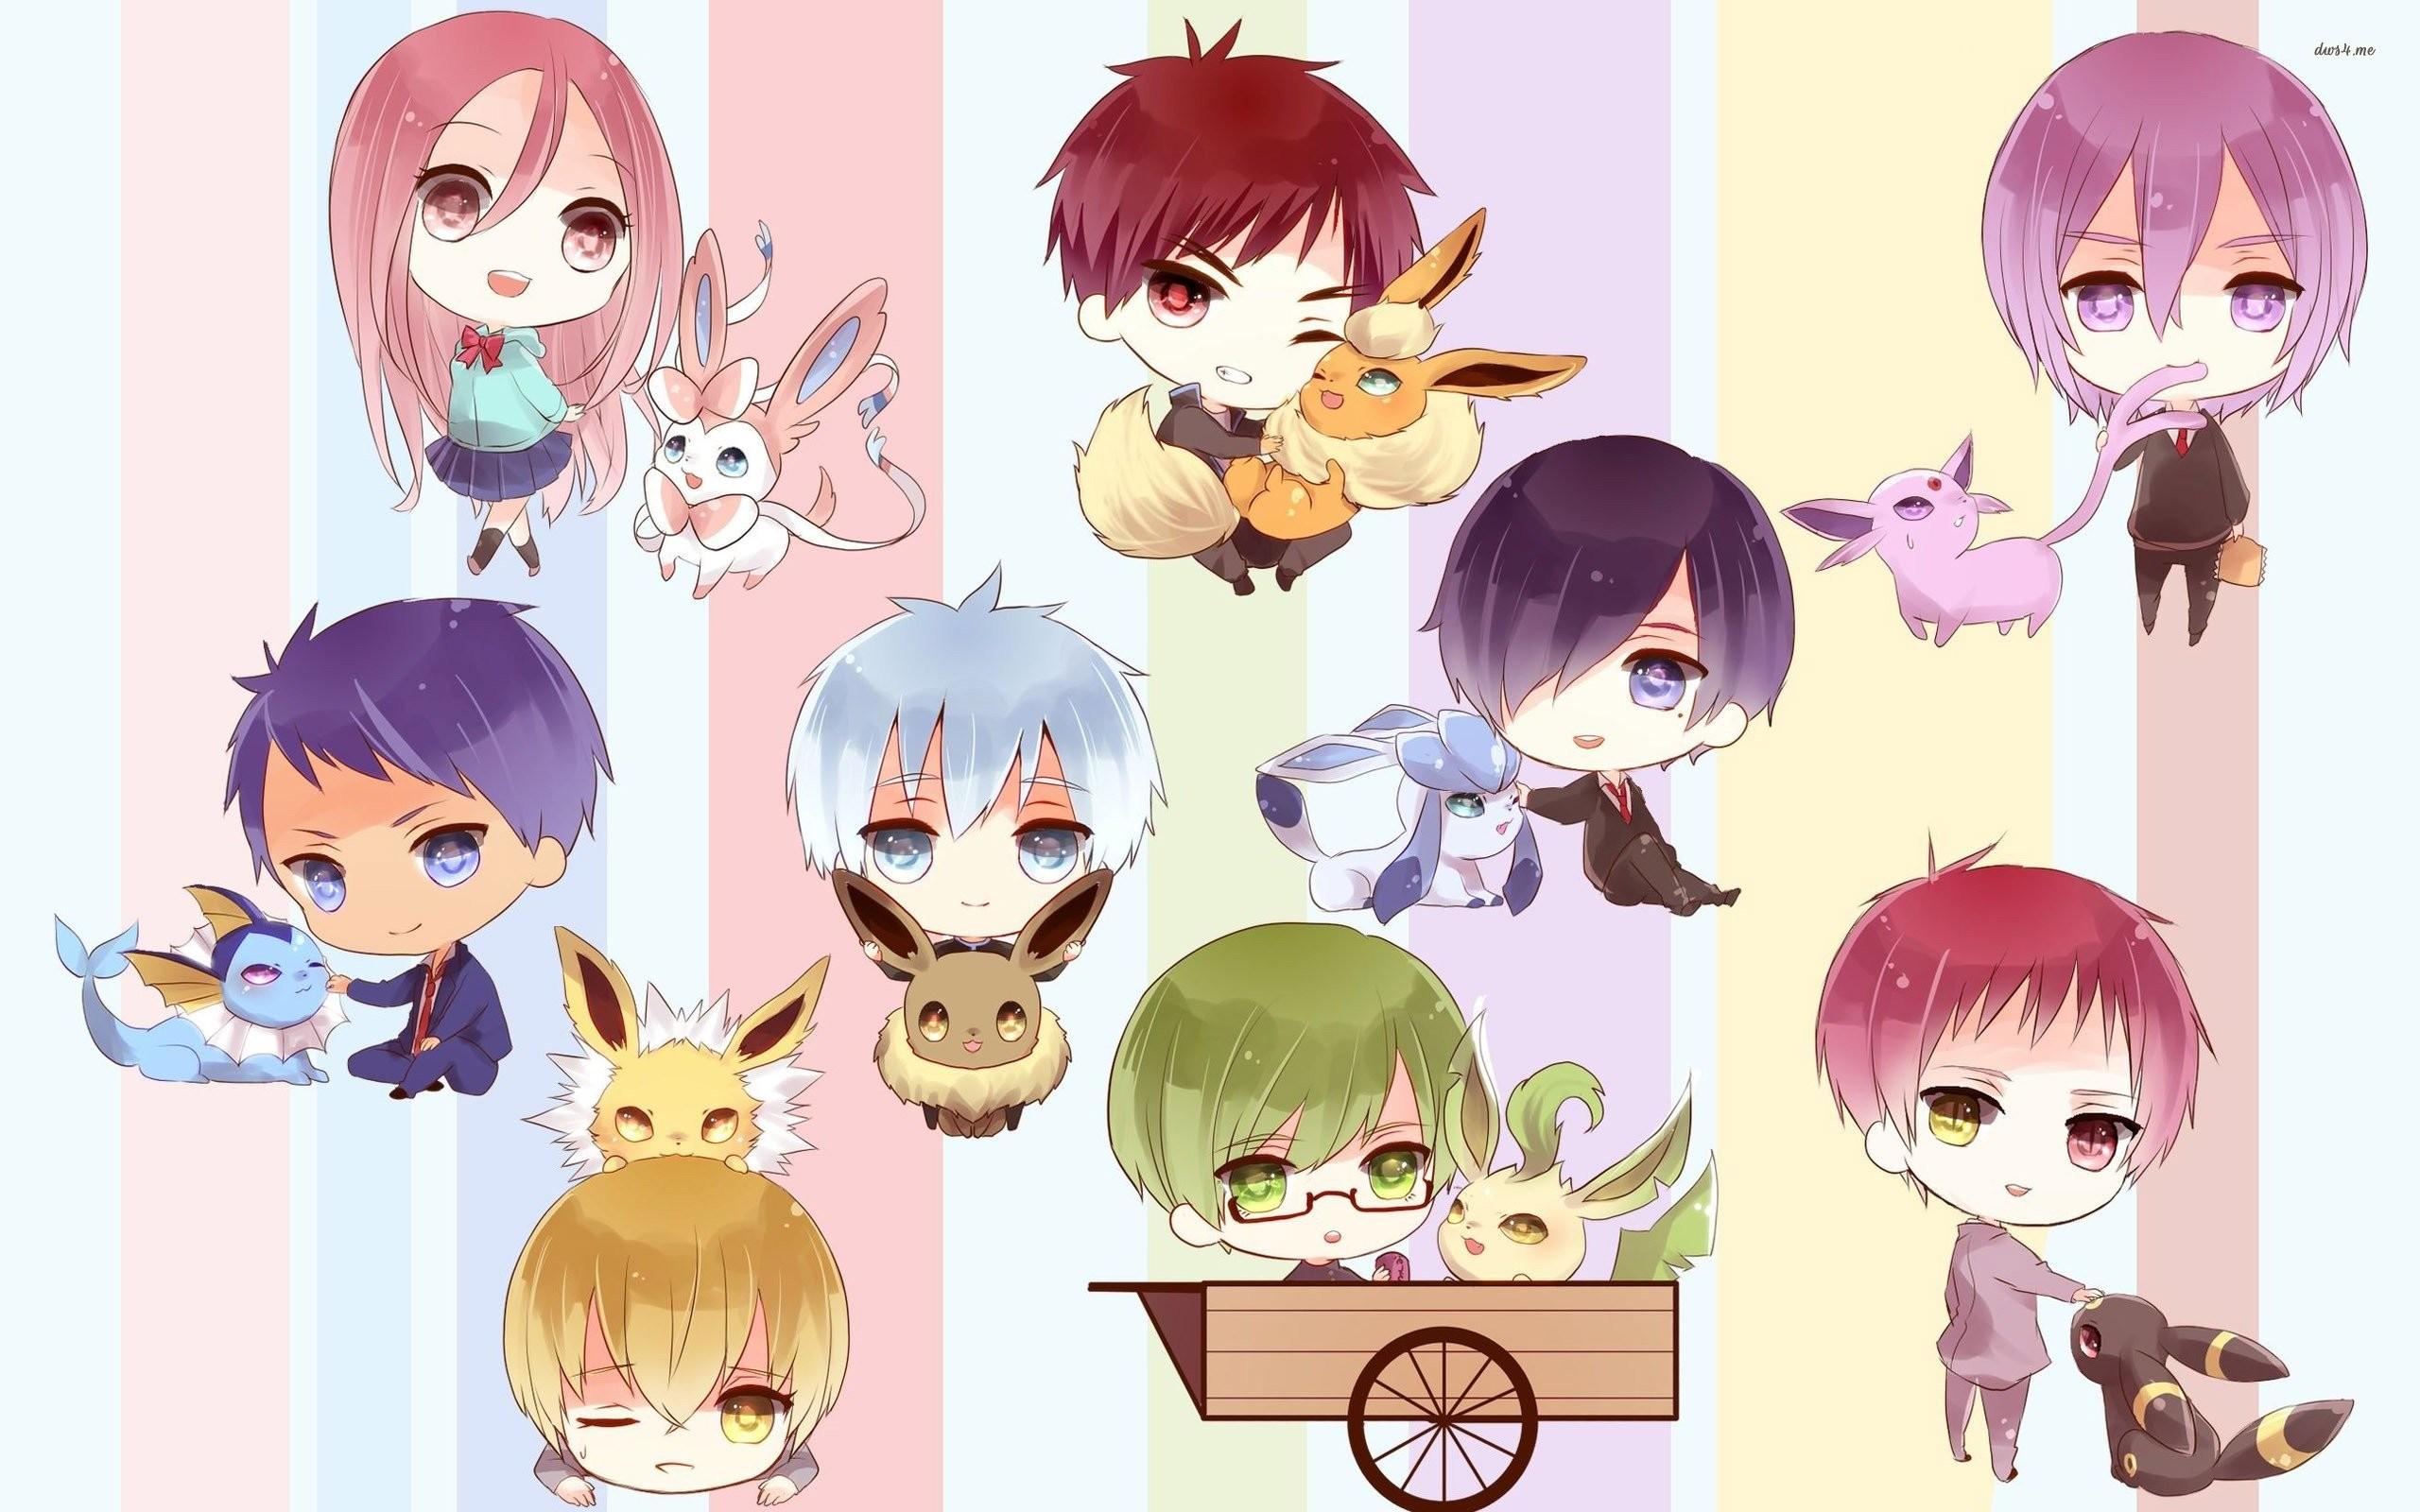 Res: 2560x1600, kuroko's basketball characters with pokemon